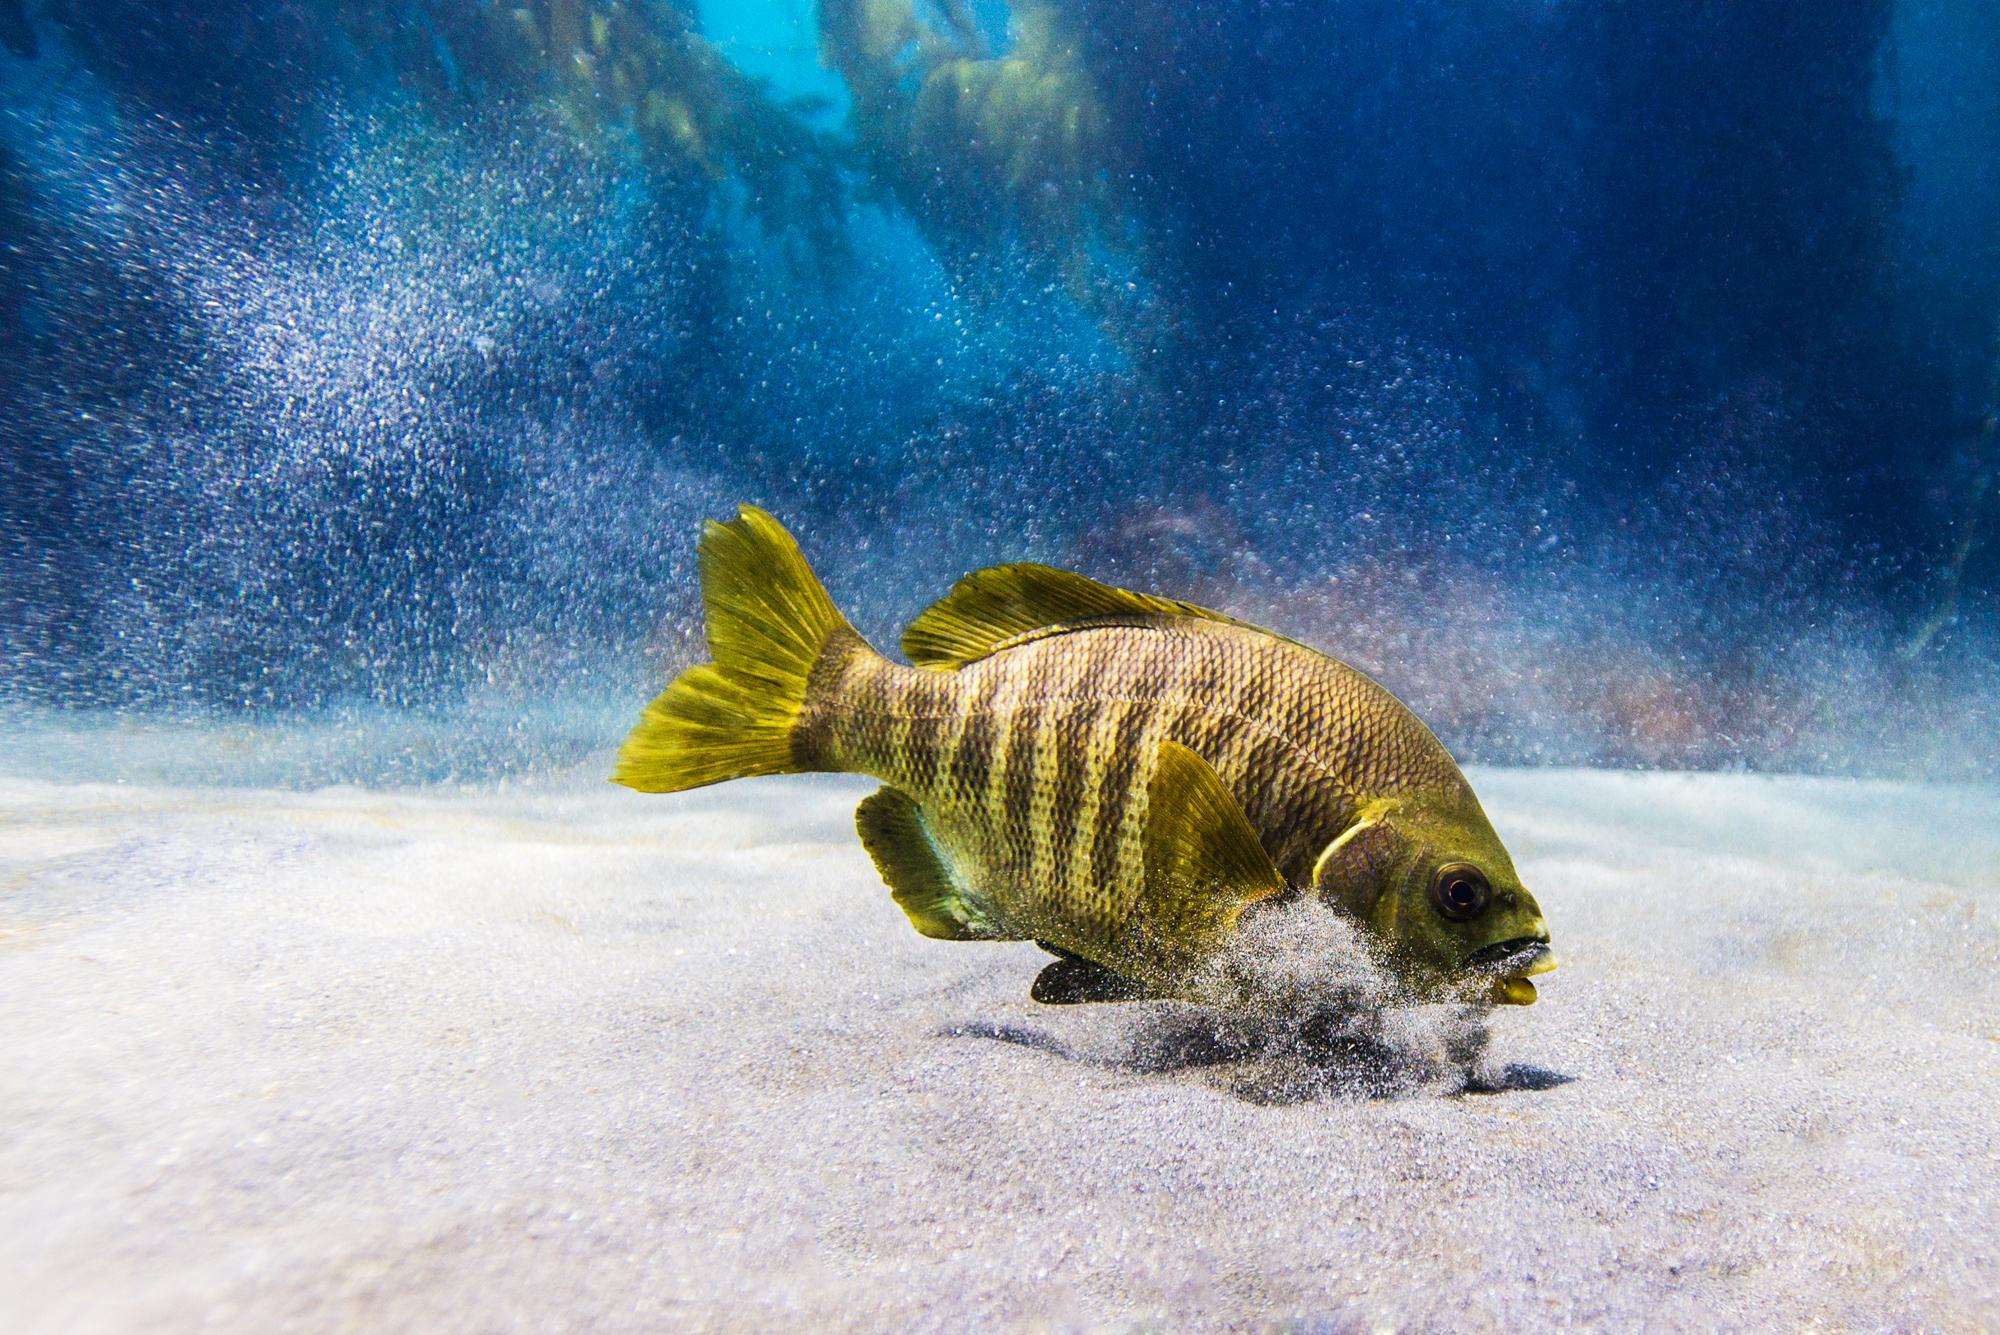 This fish